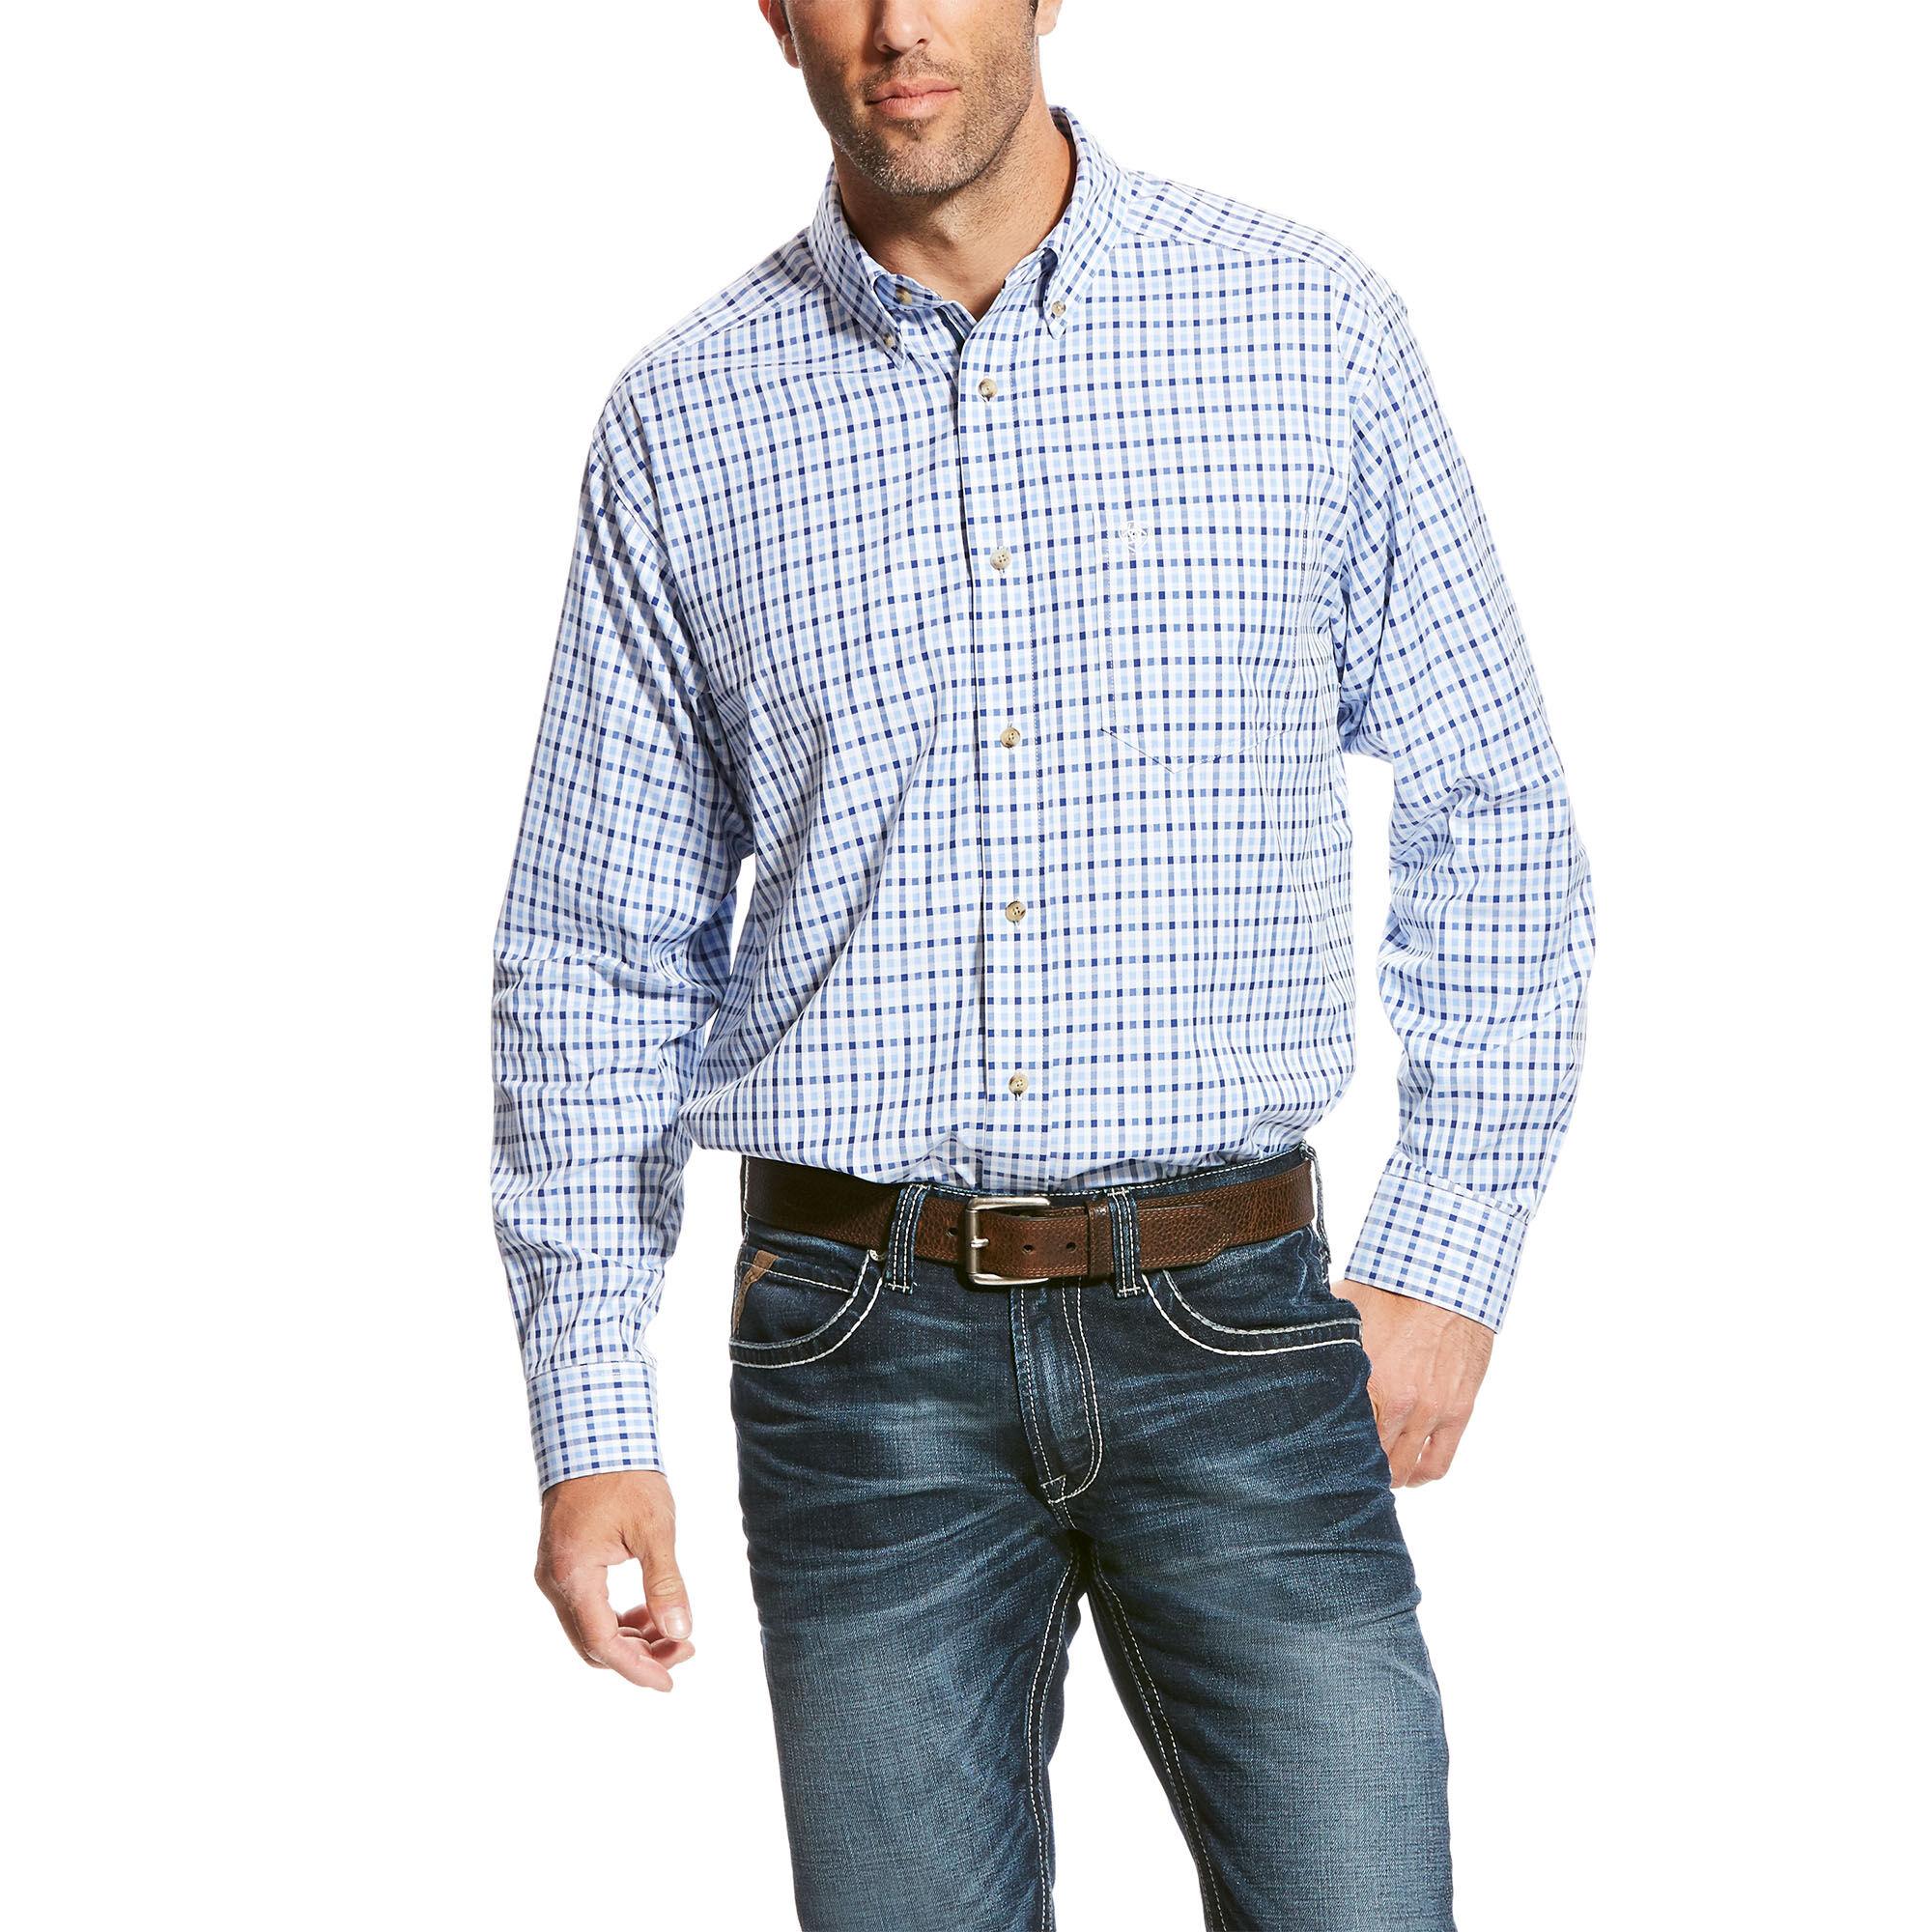 Pro Series Sinclair Shirt